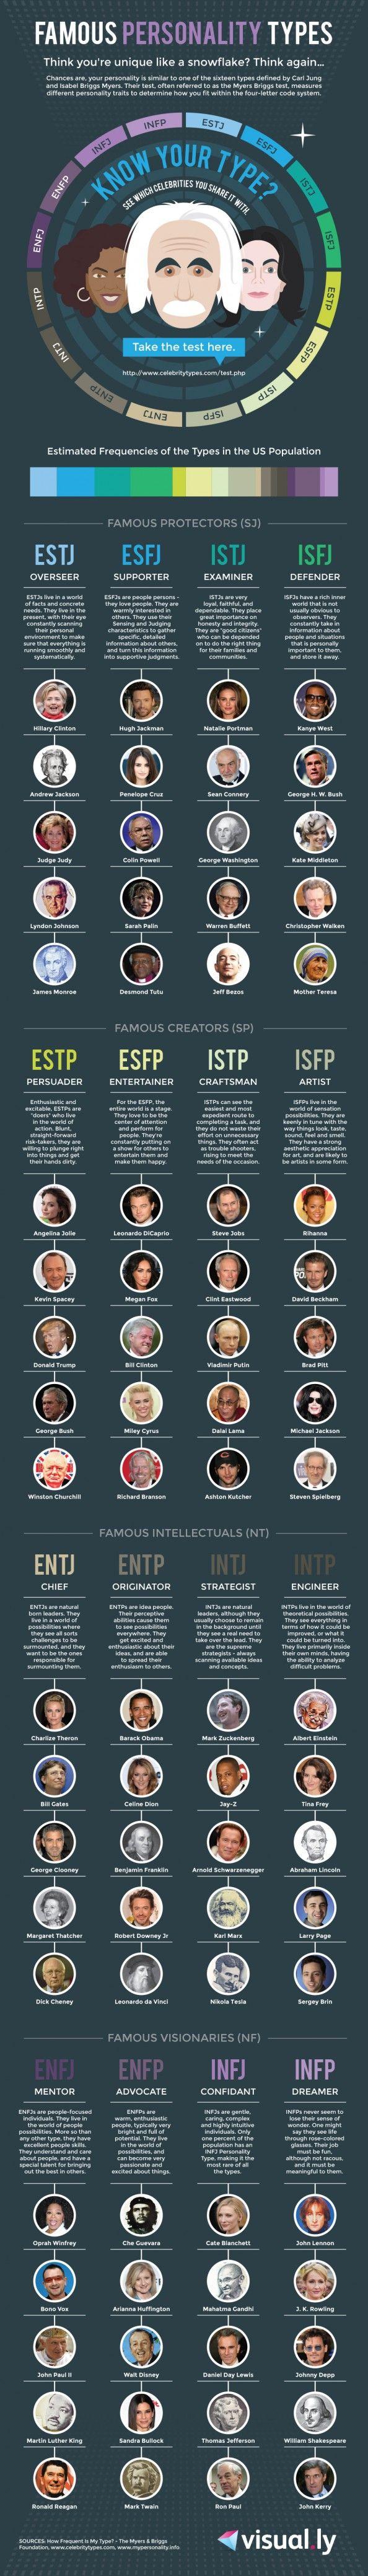 1556600857_364_Infographic-Psychiatrist-Defines-16-Personality-Types-Which-One-Are Infographic : Psychiatrist Defines 16 Personality Types, Which One Are You?